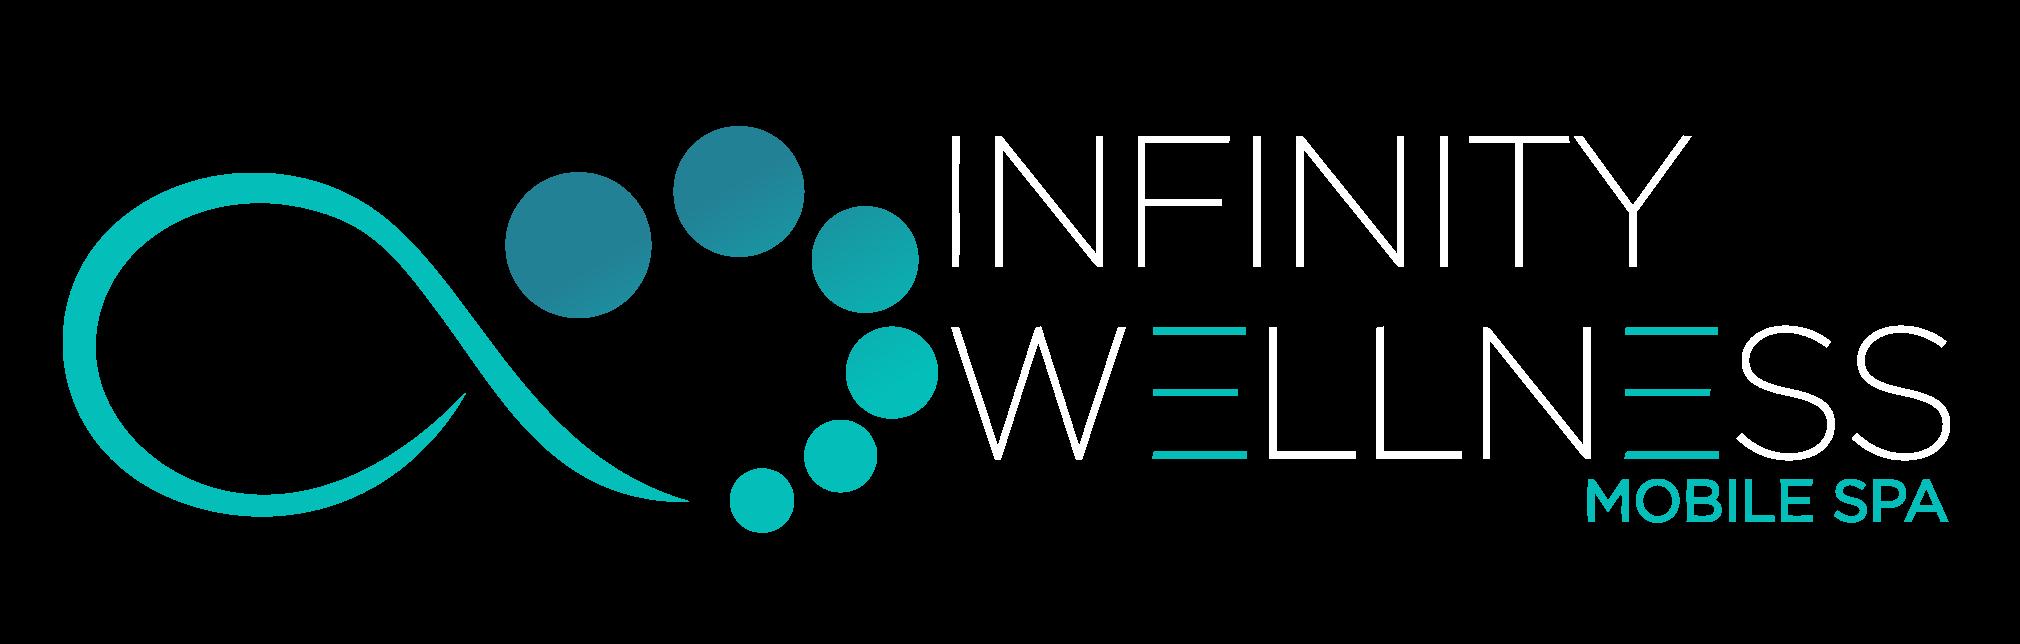 Infinity Wellness  Mobile Spa